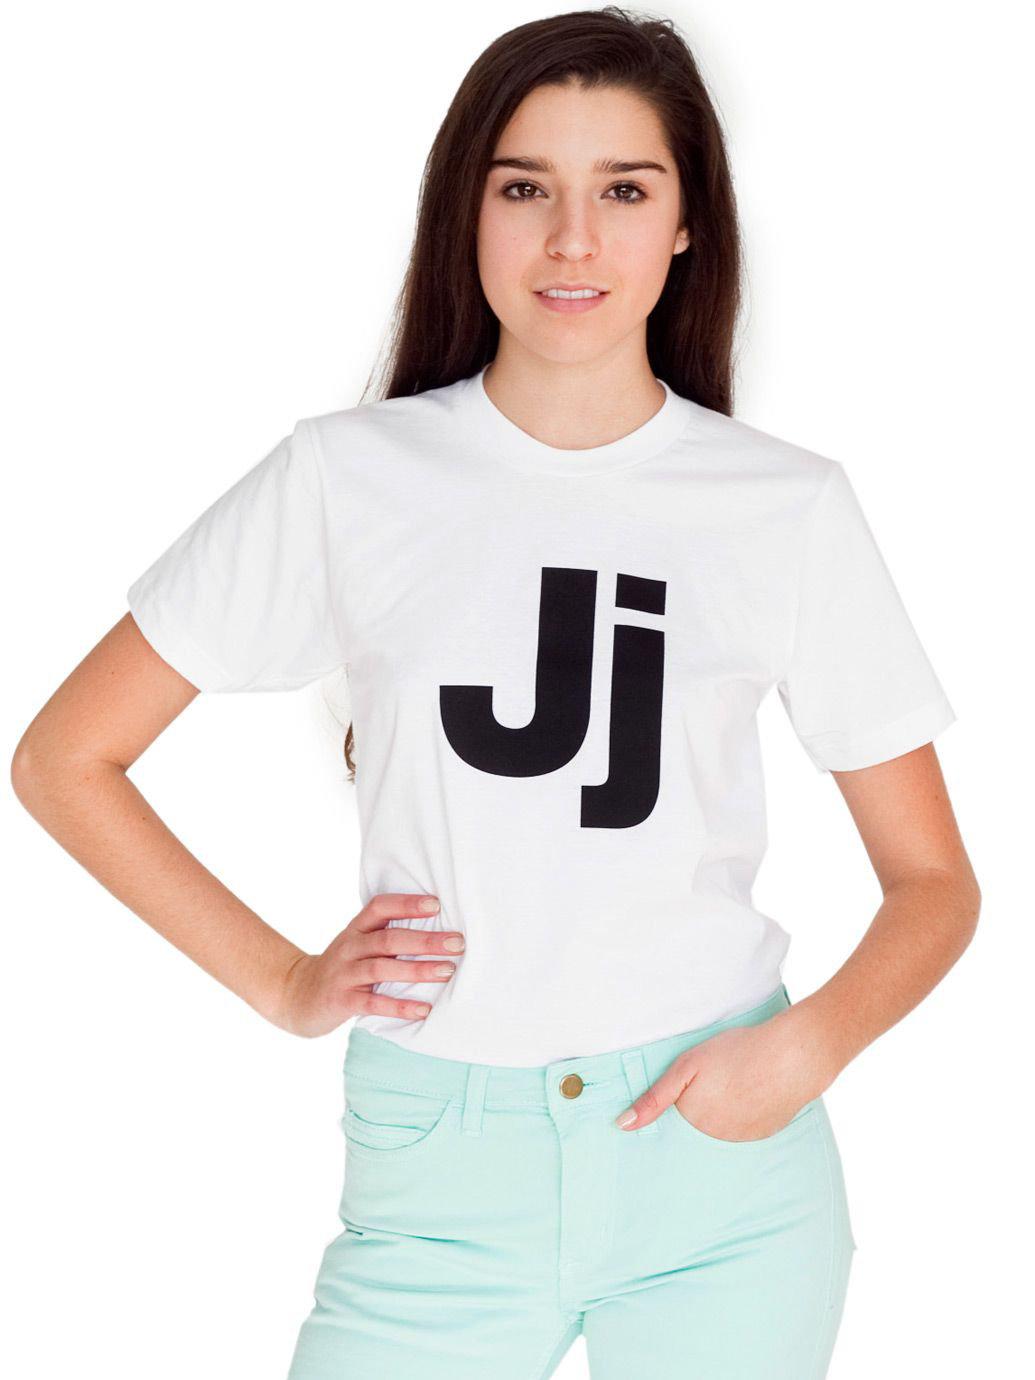 Unisex Helvetica Alphabet T-Shirt | American Apparel